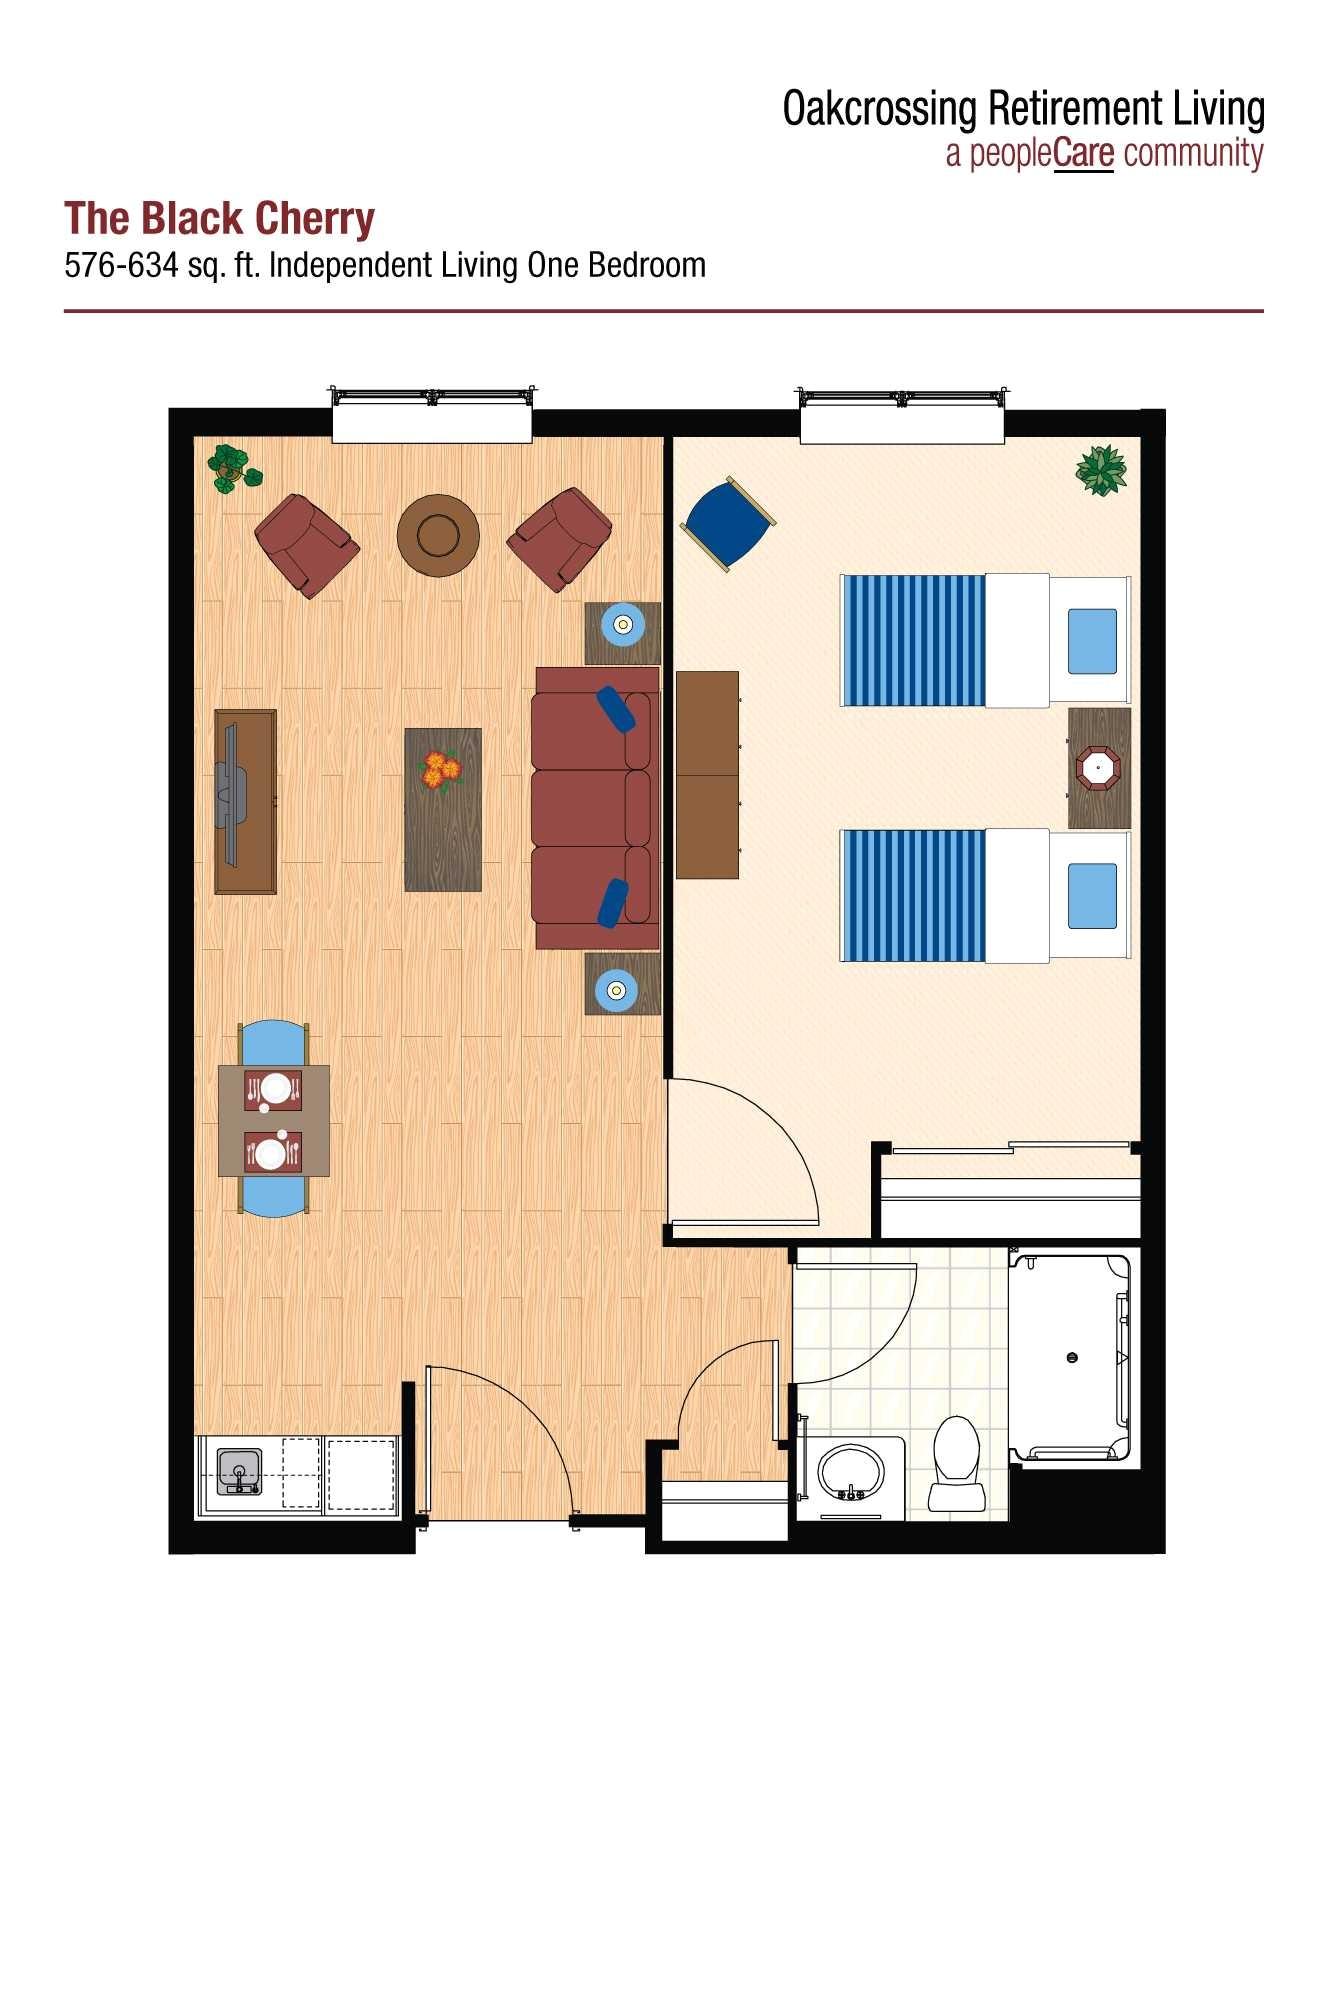 retirement village house plans or oakcrossing retirement living peoplecare